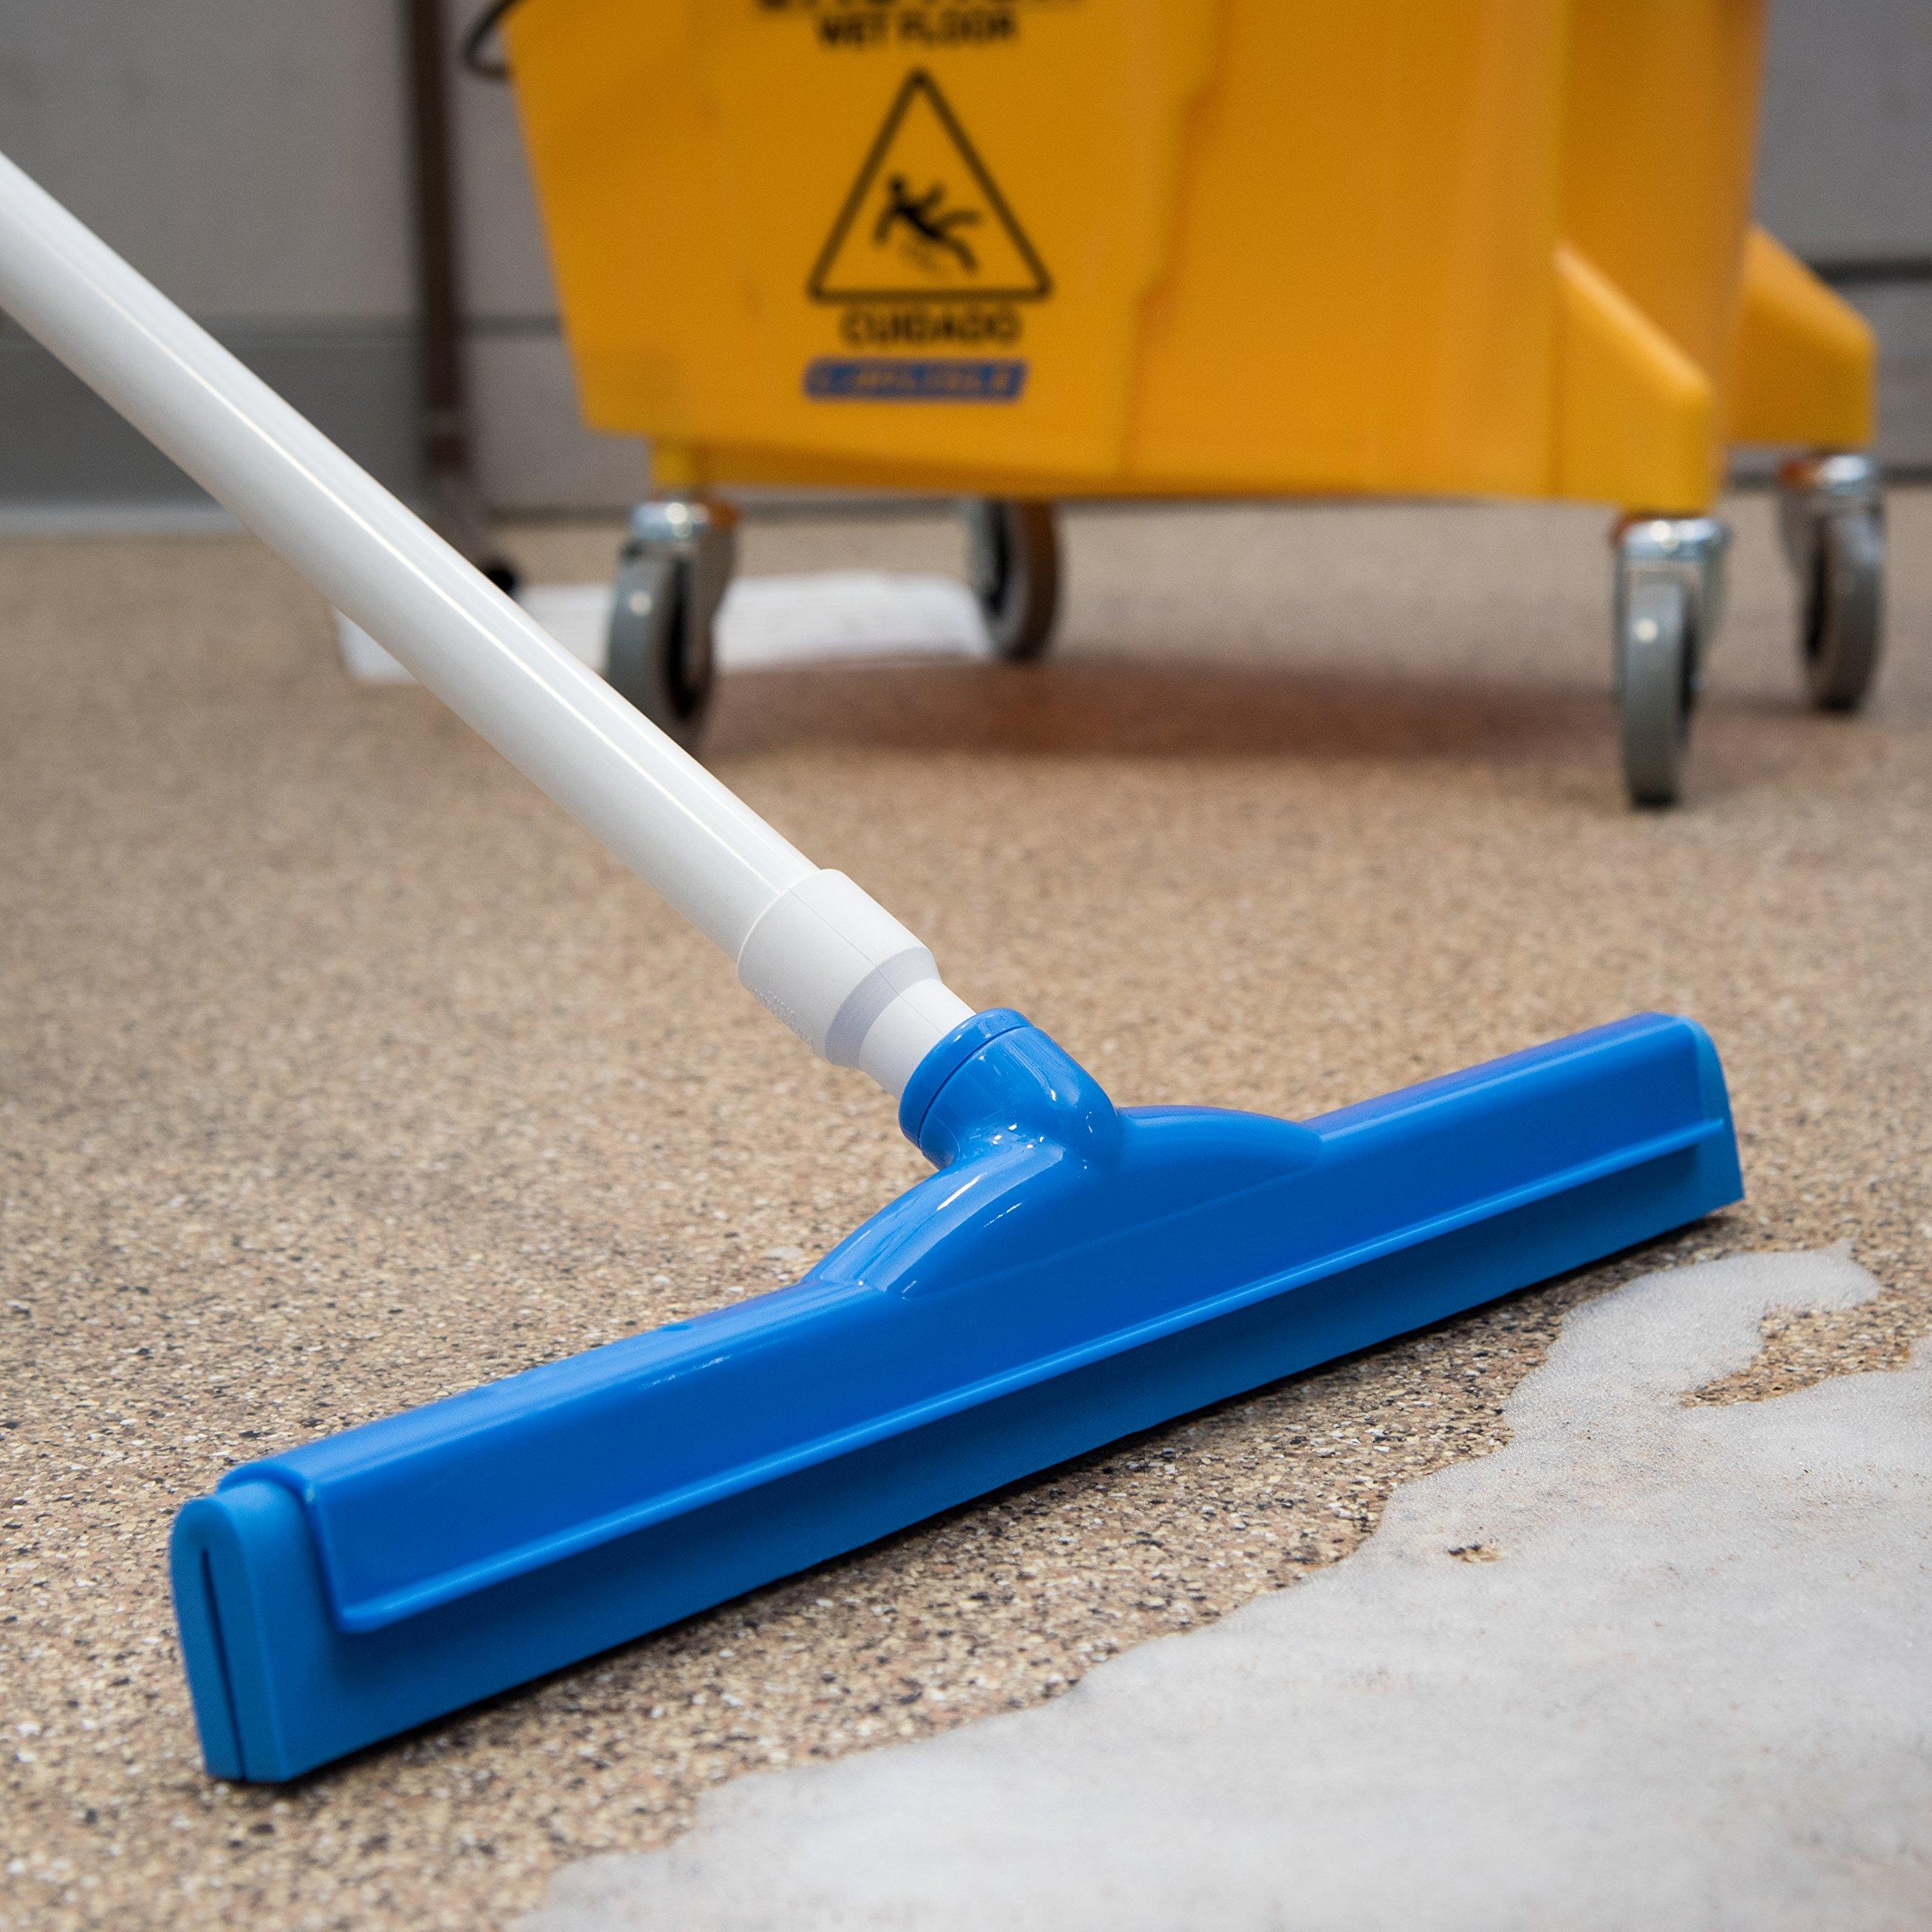 Carlisle 4156714 Spectrum Plastic Double Foam Rubber Hygienic Floor Squeegee, 18'' Width, Blue (Case of 6) by Carlisle (Image #5)